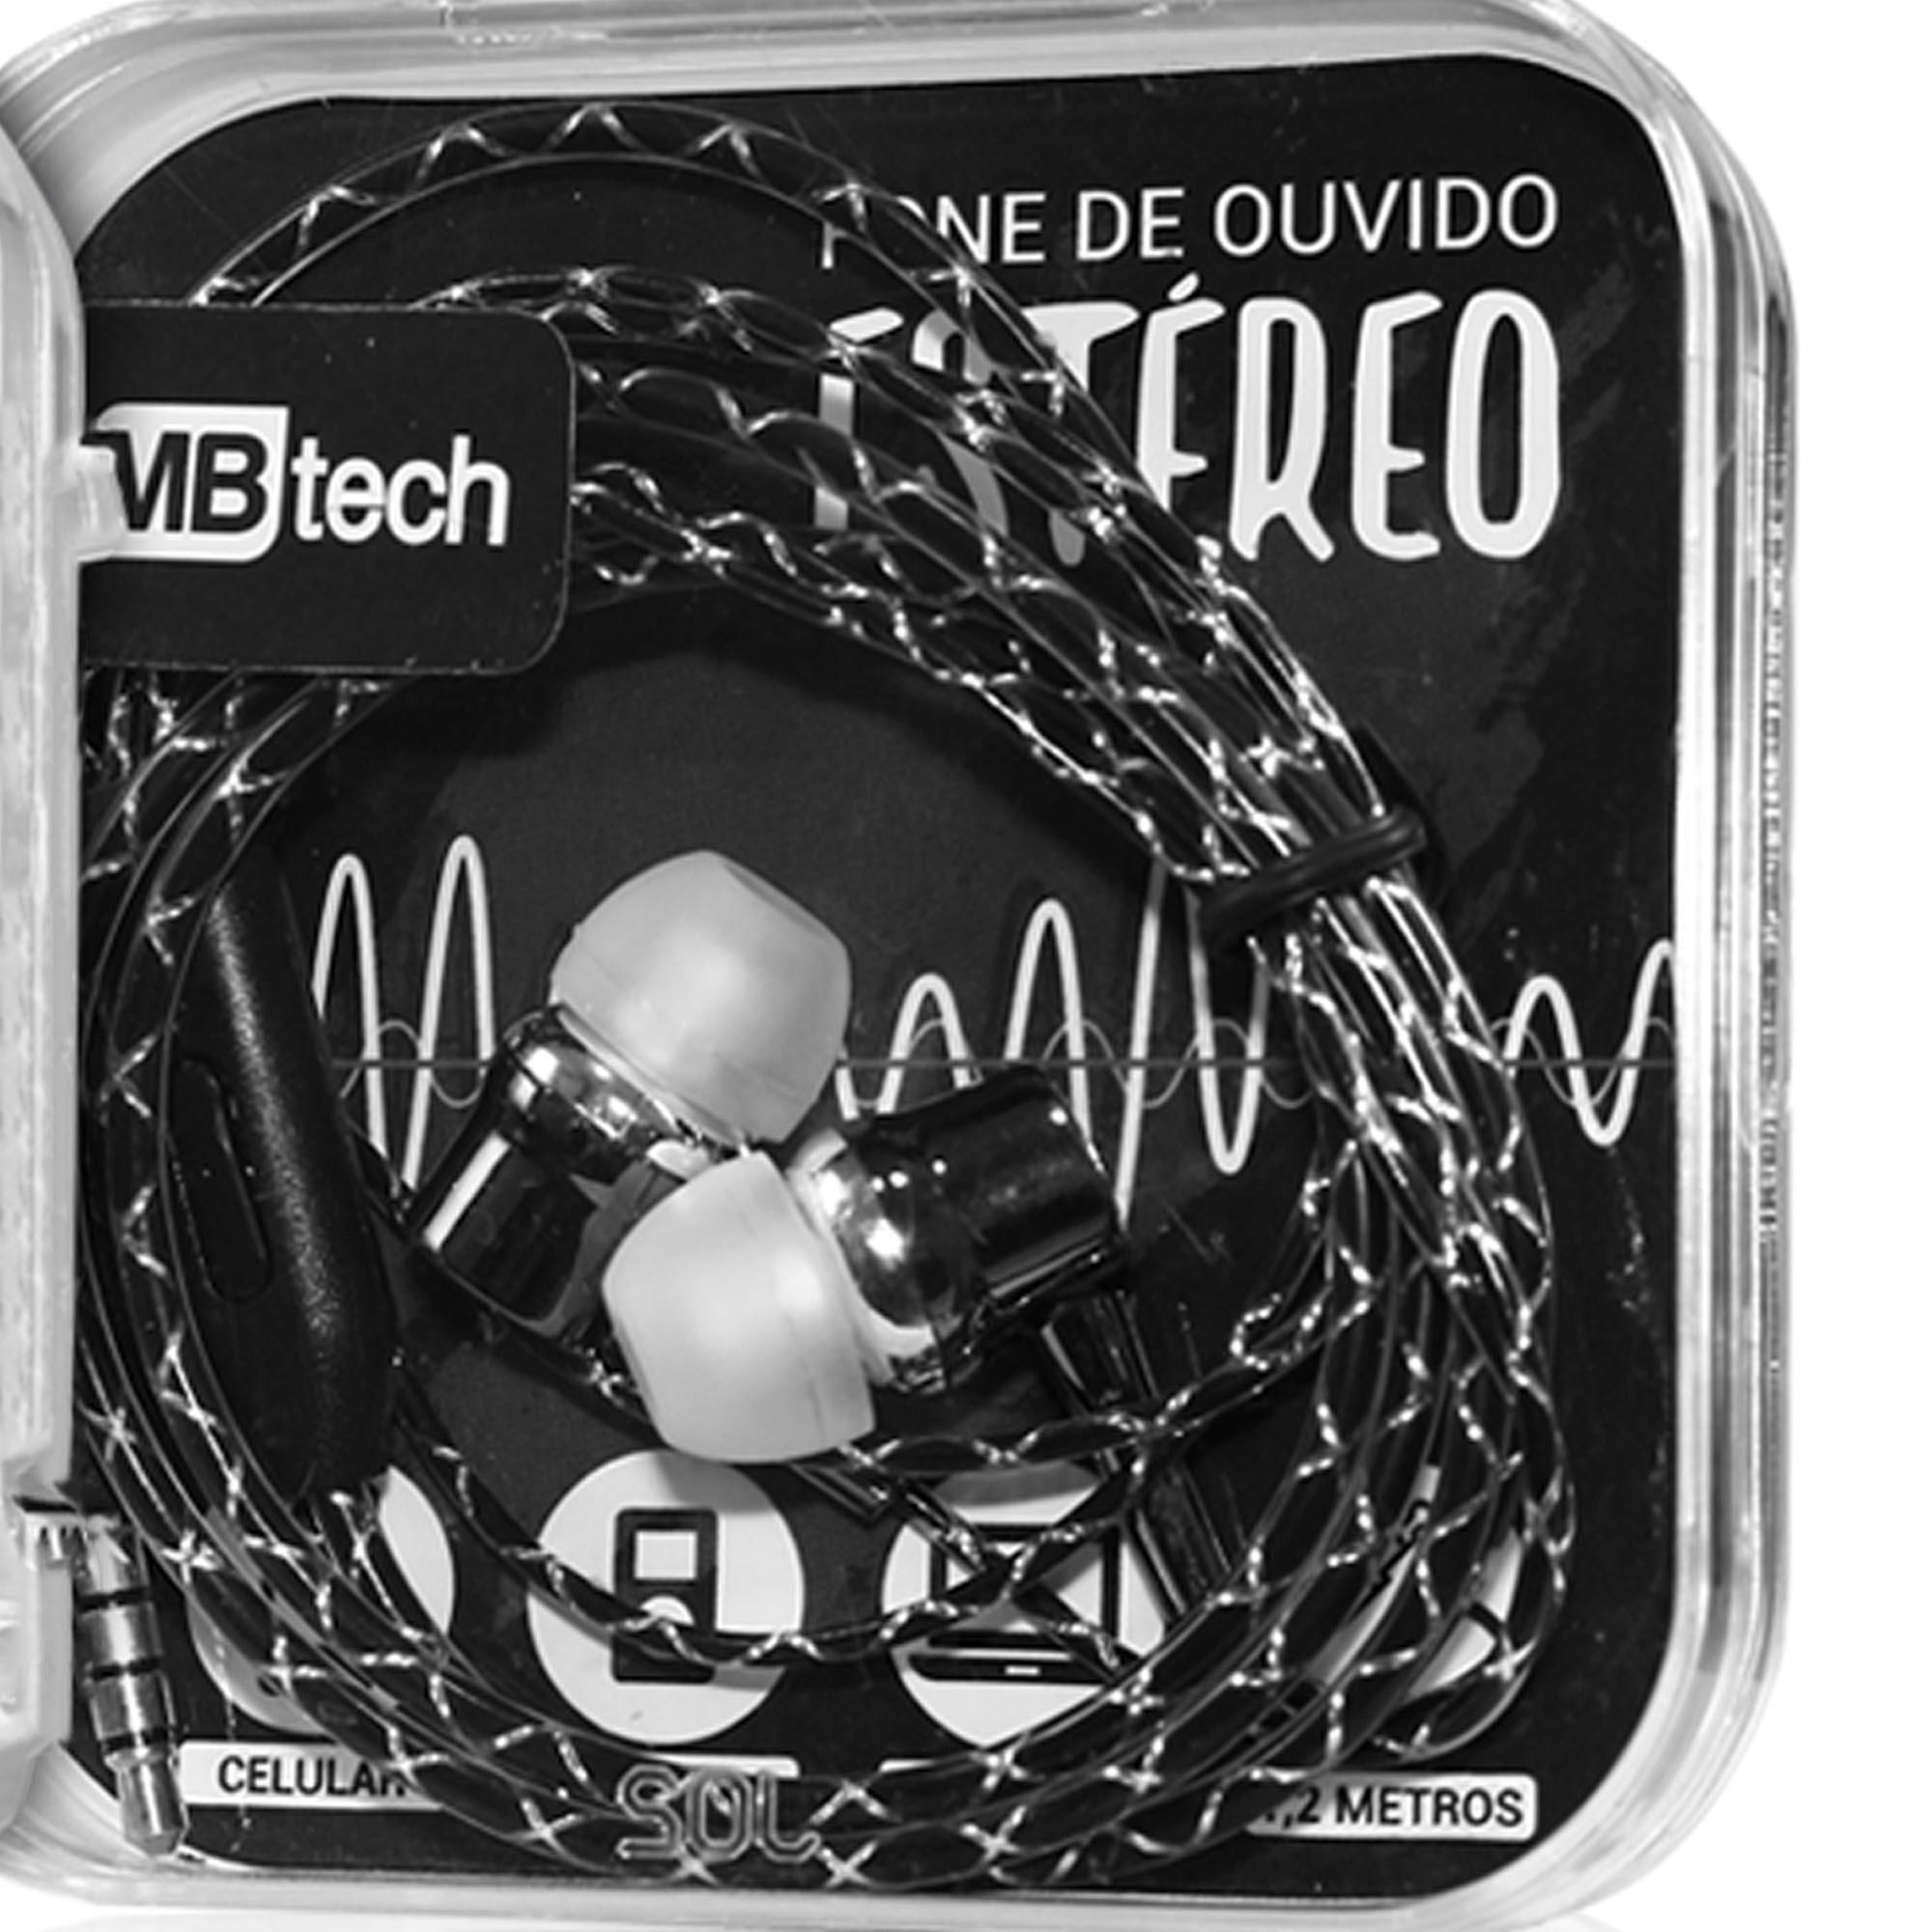 FONE DE OUVIDO ESTÉREO COM MICROFONE PRETO - MBTECH